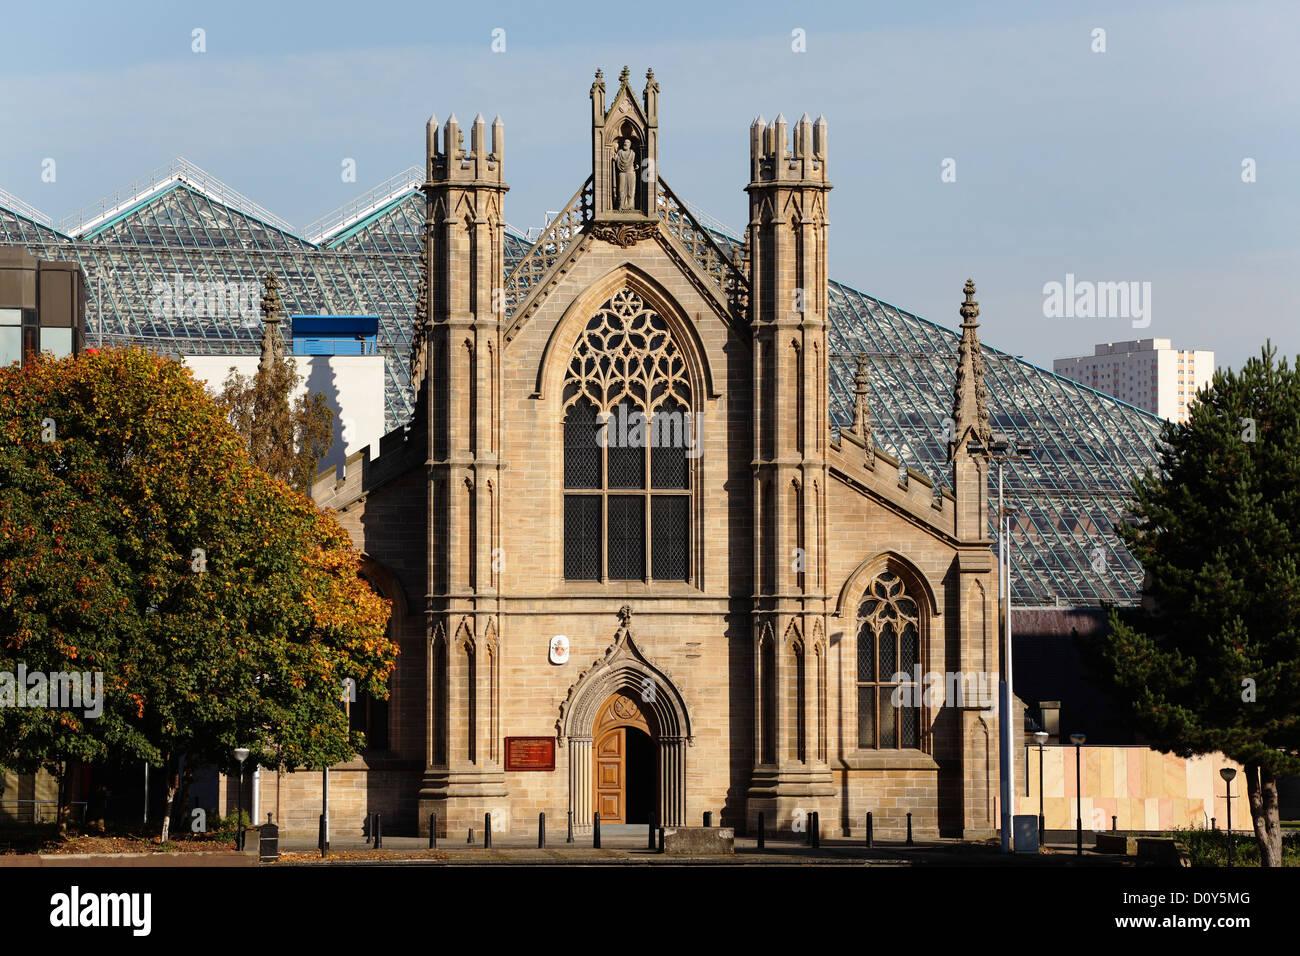 St Andrew's catedral Católica Romana, Glasgow, Escocia, Reino Unido Foto de stock